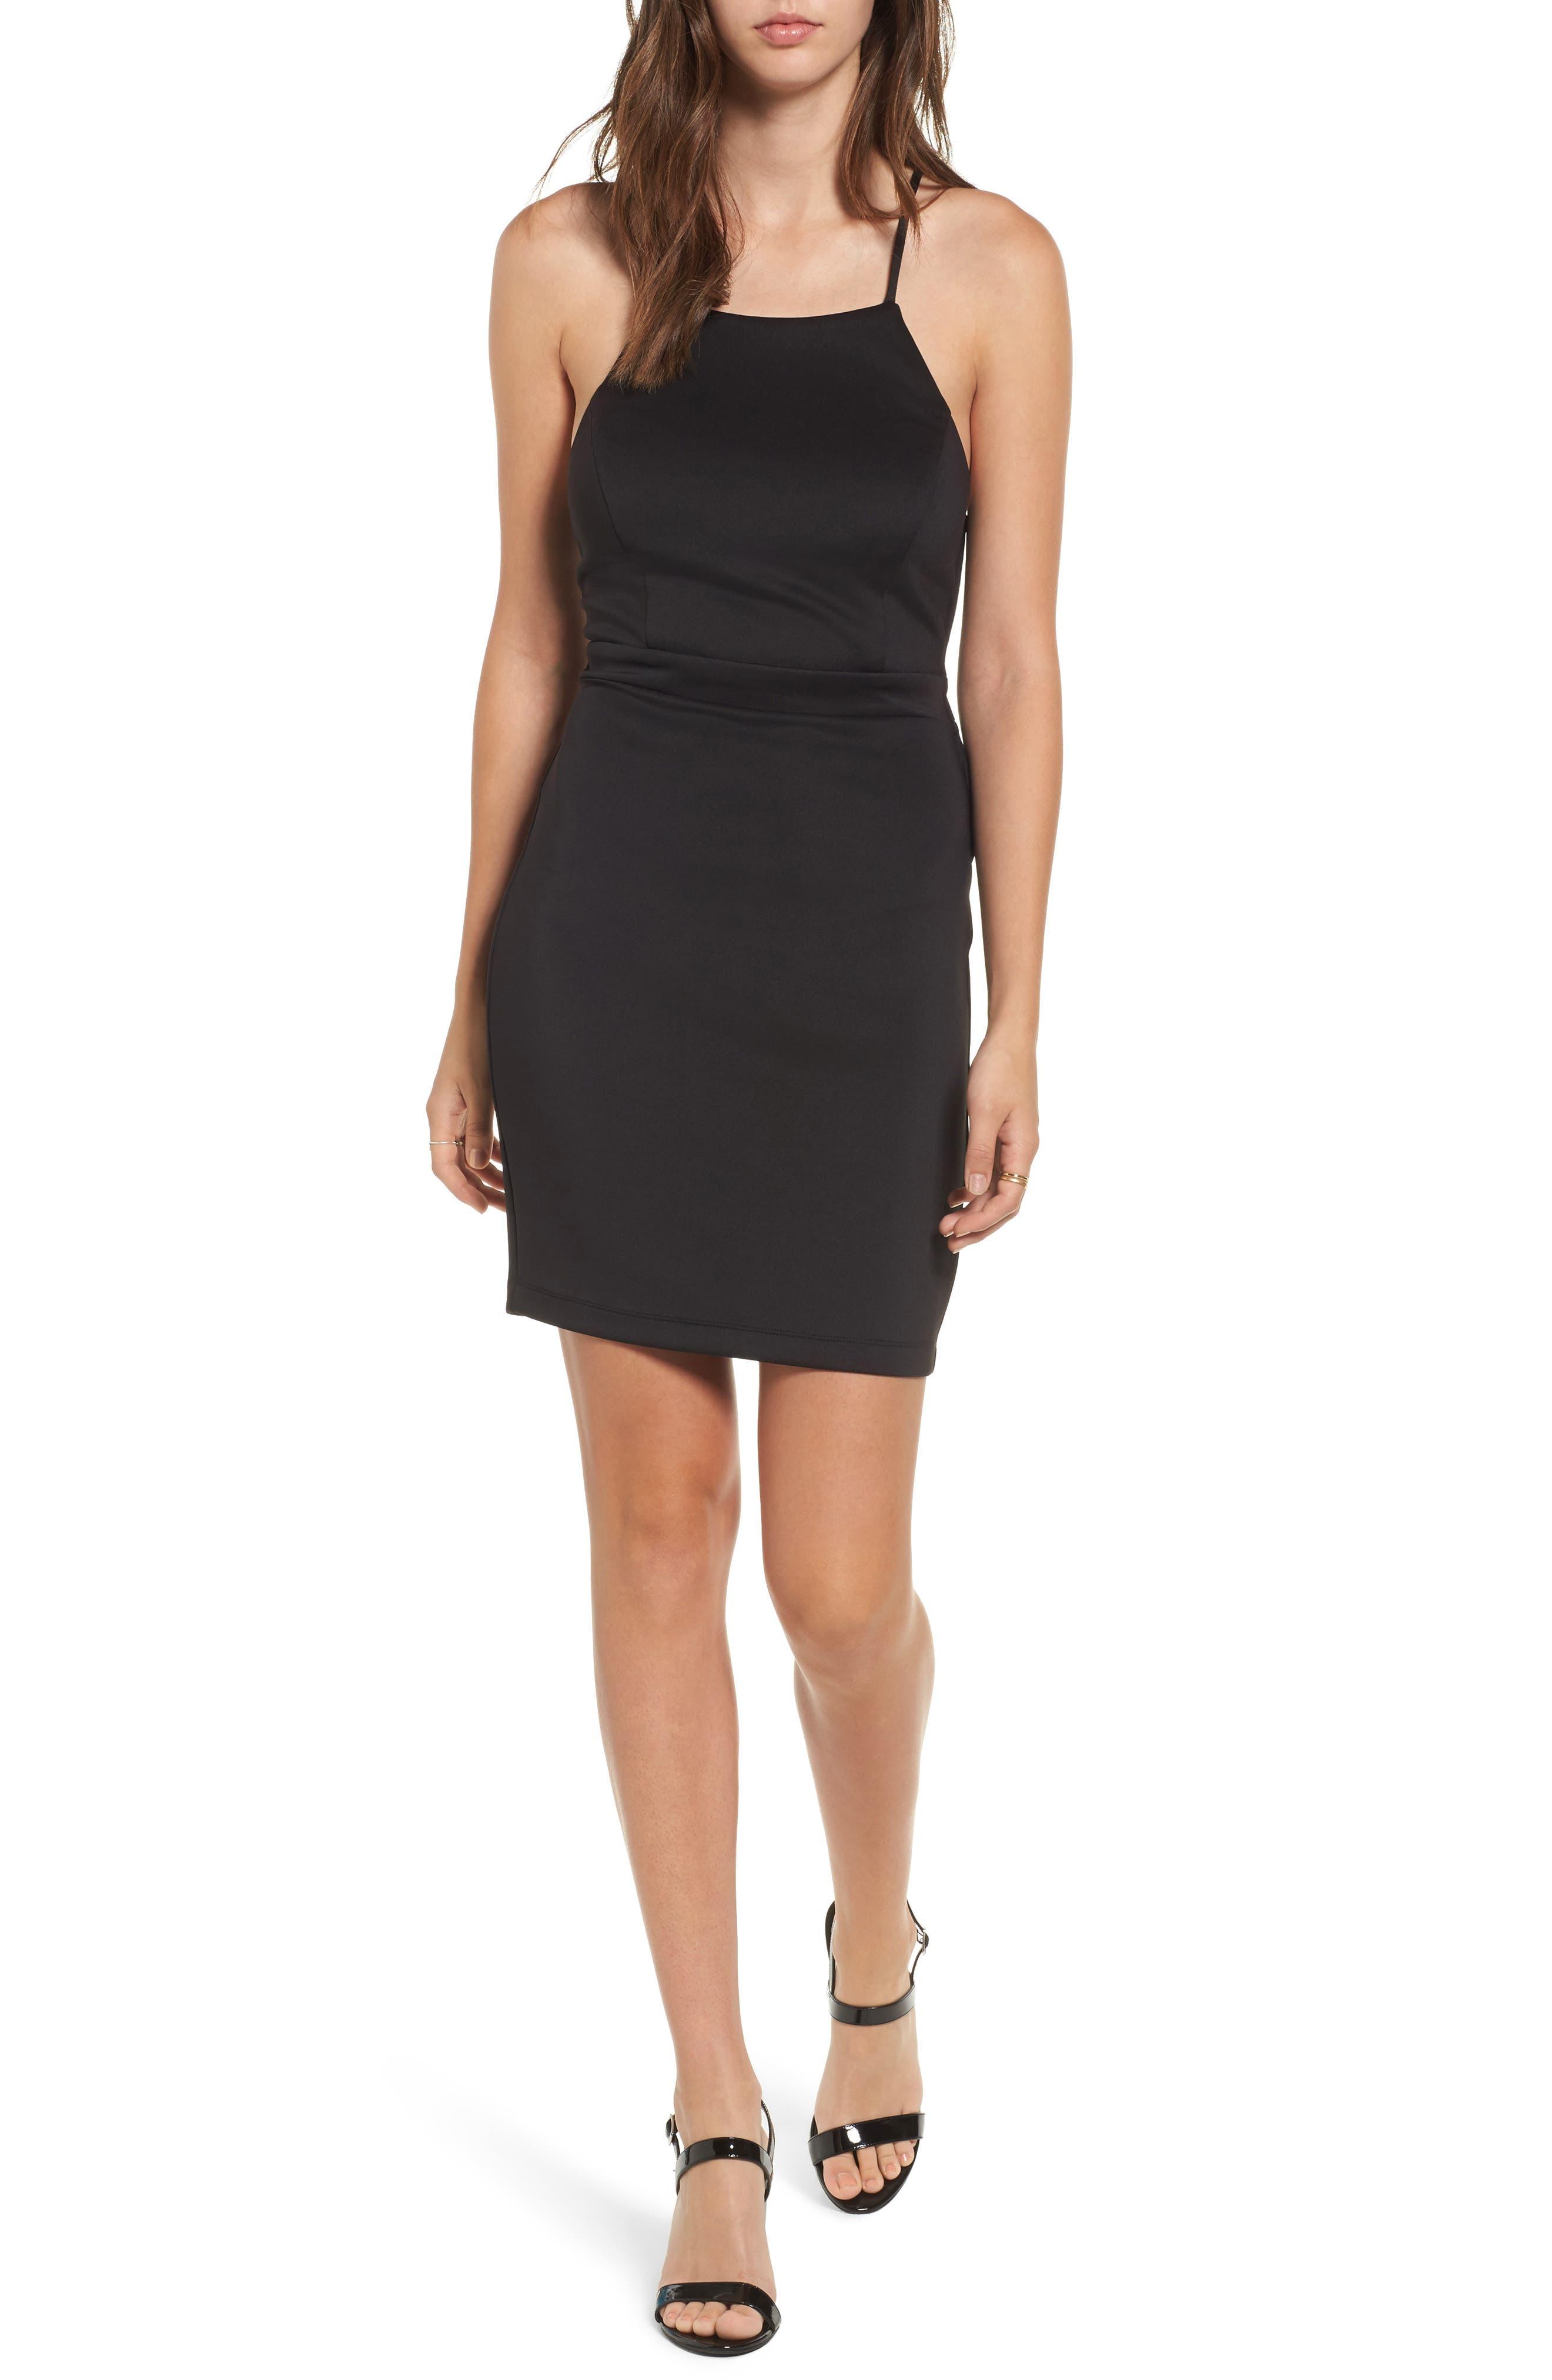 Love, Nickie Lew Strappy Body-Con Dress